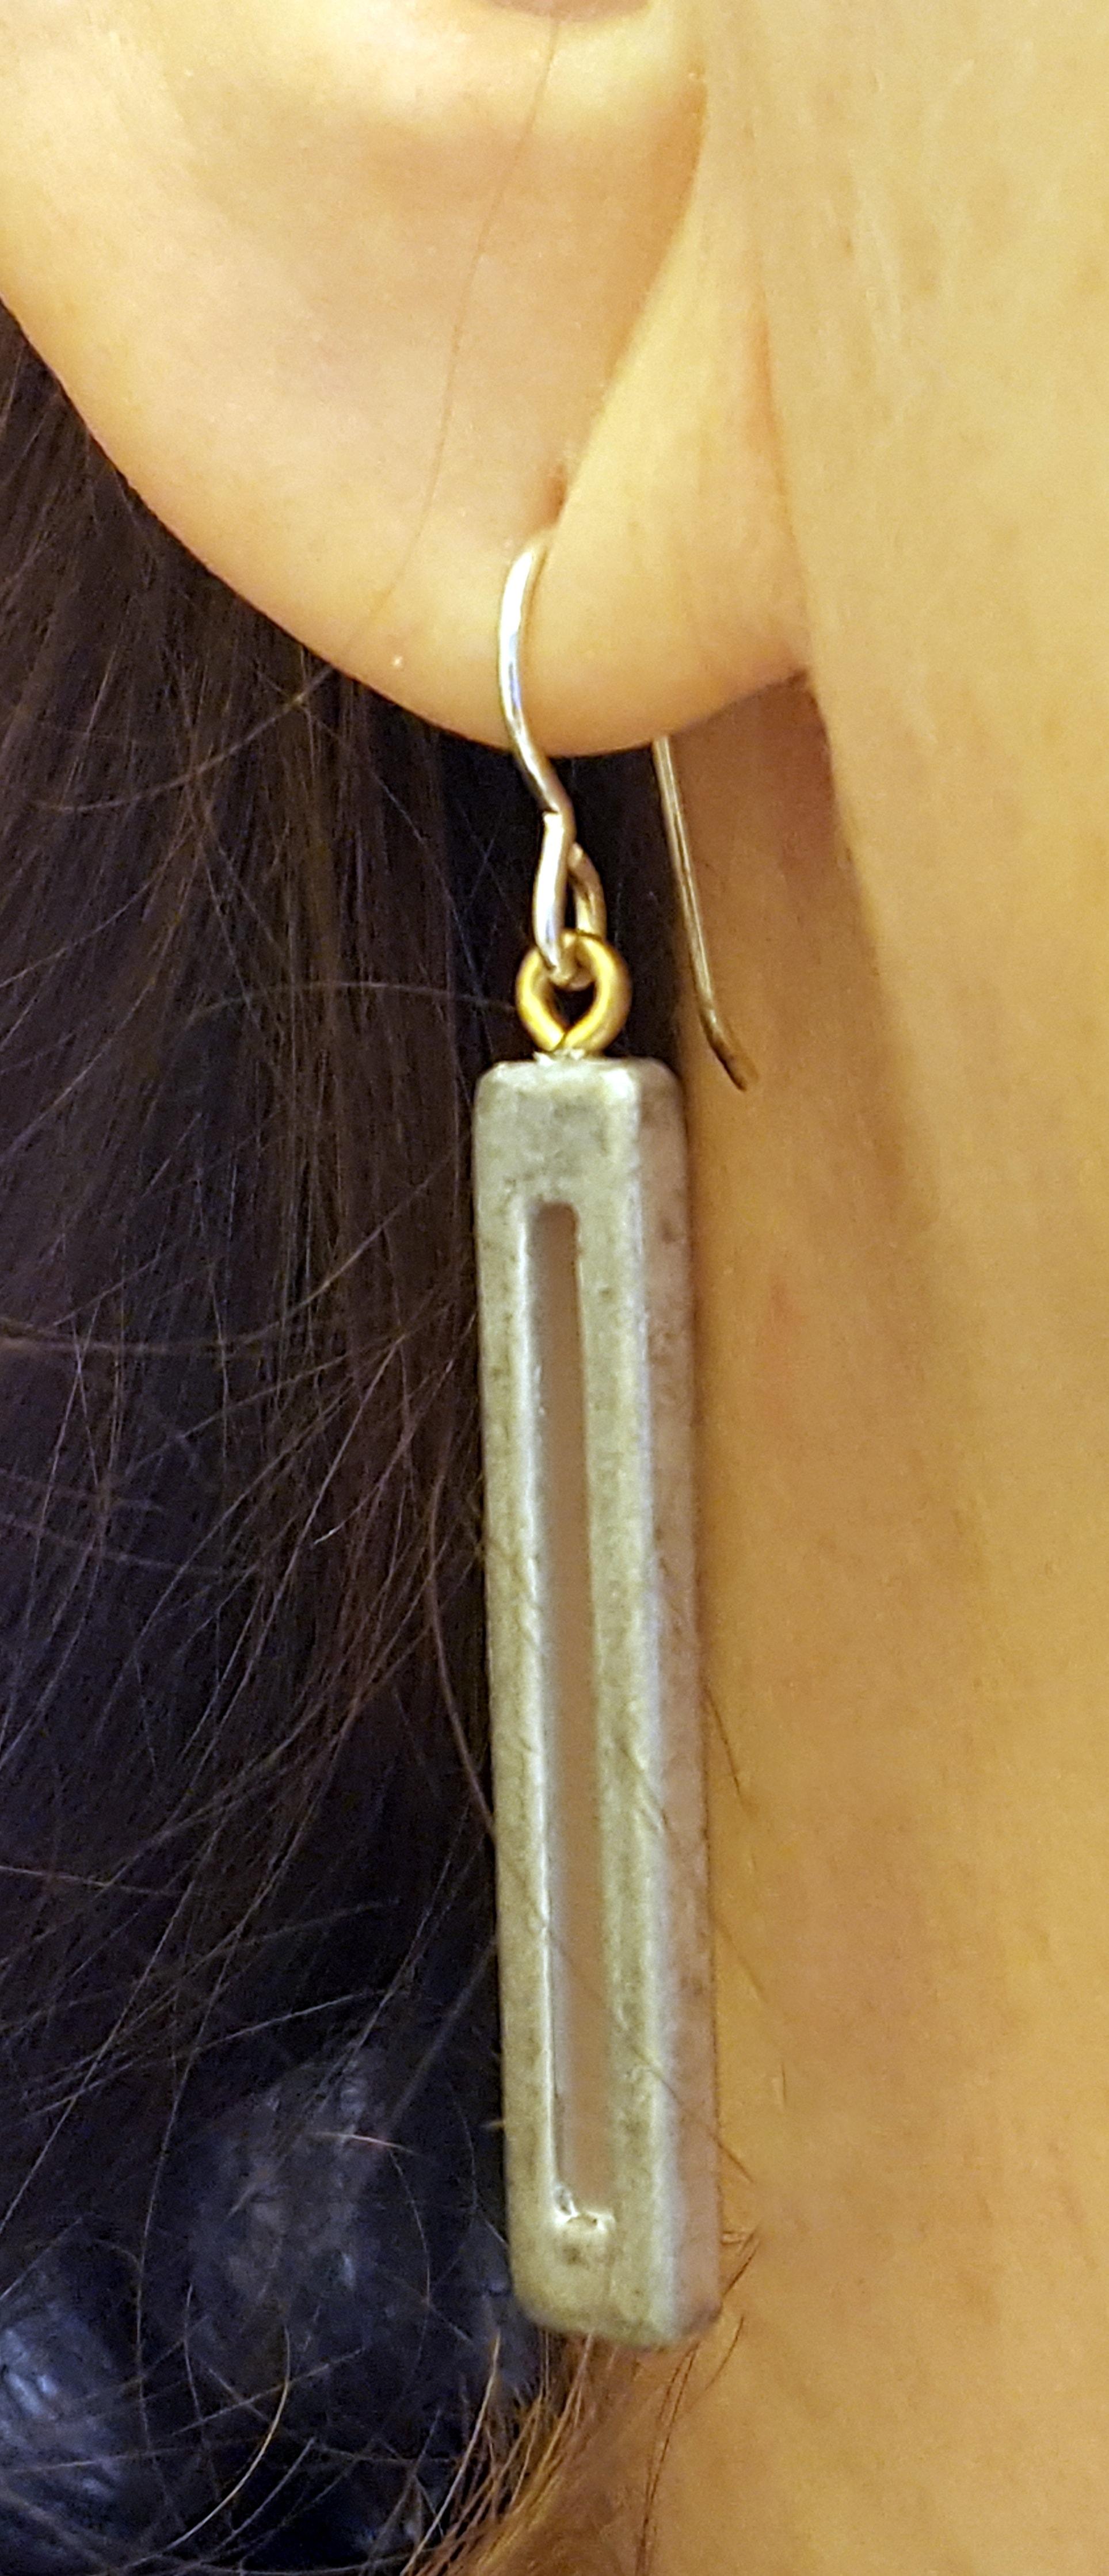 Tower of power matte silver earring on model